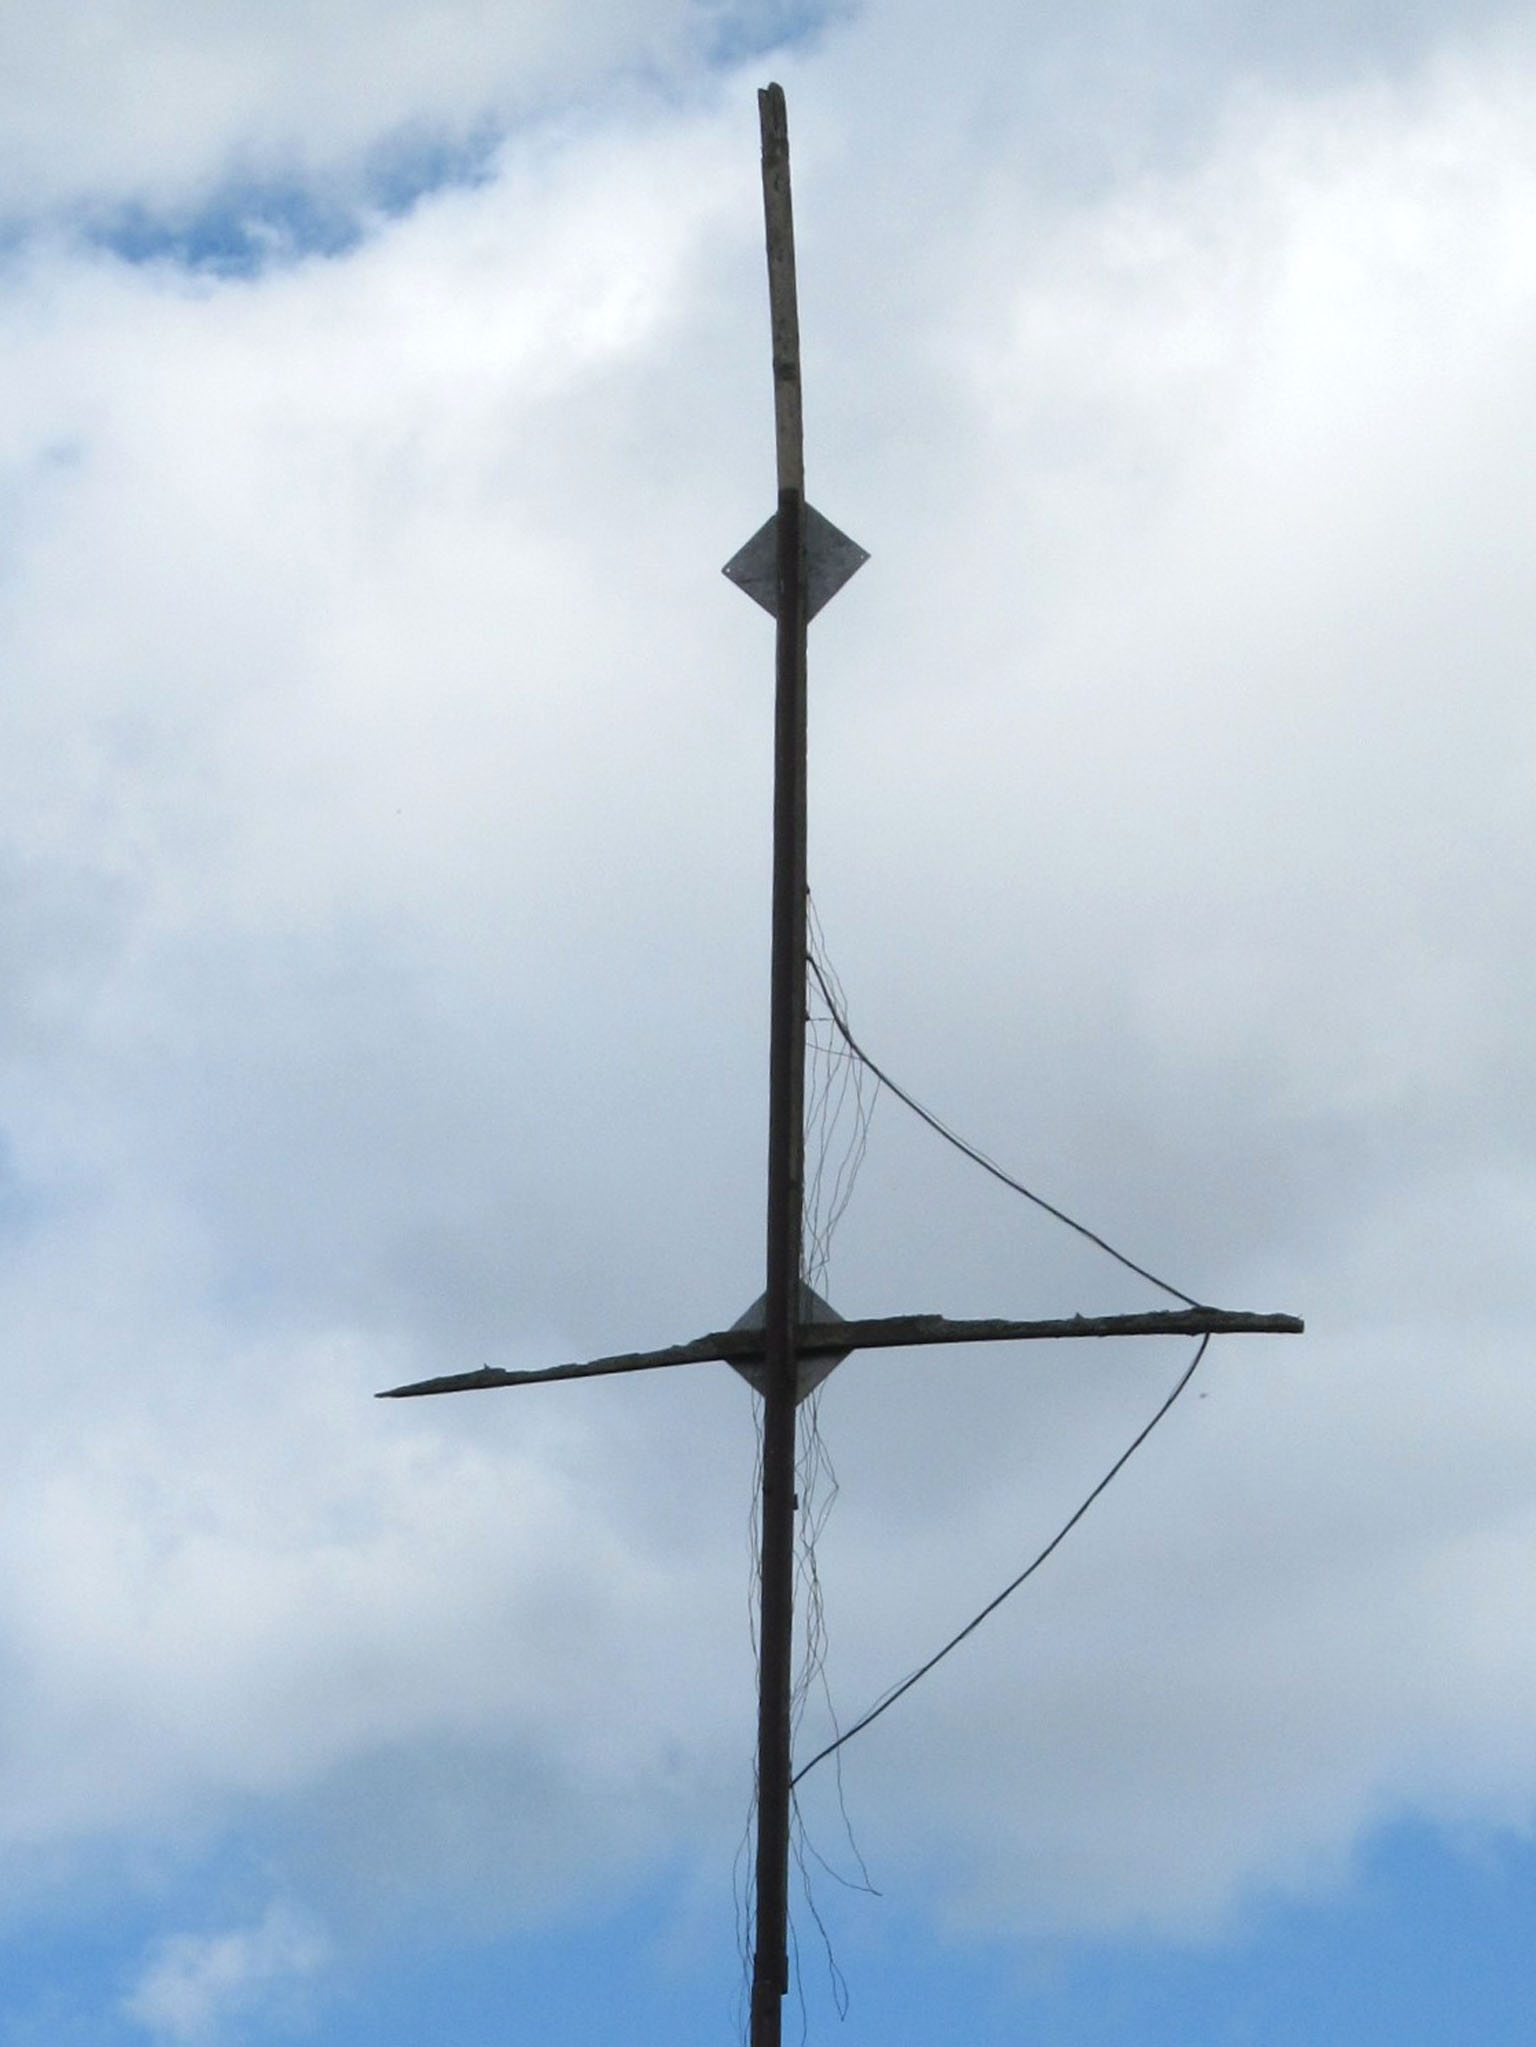 разрушенная полностью антенна